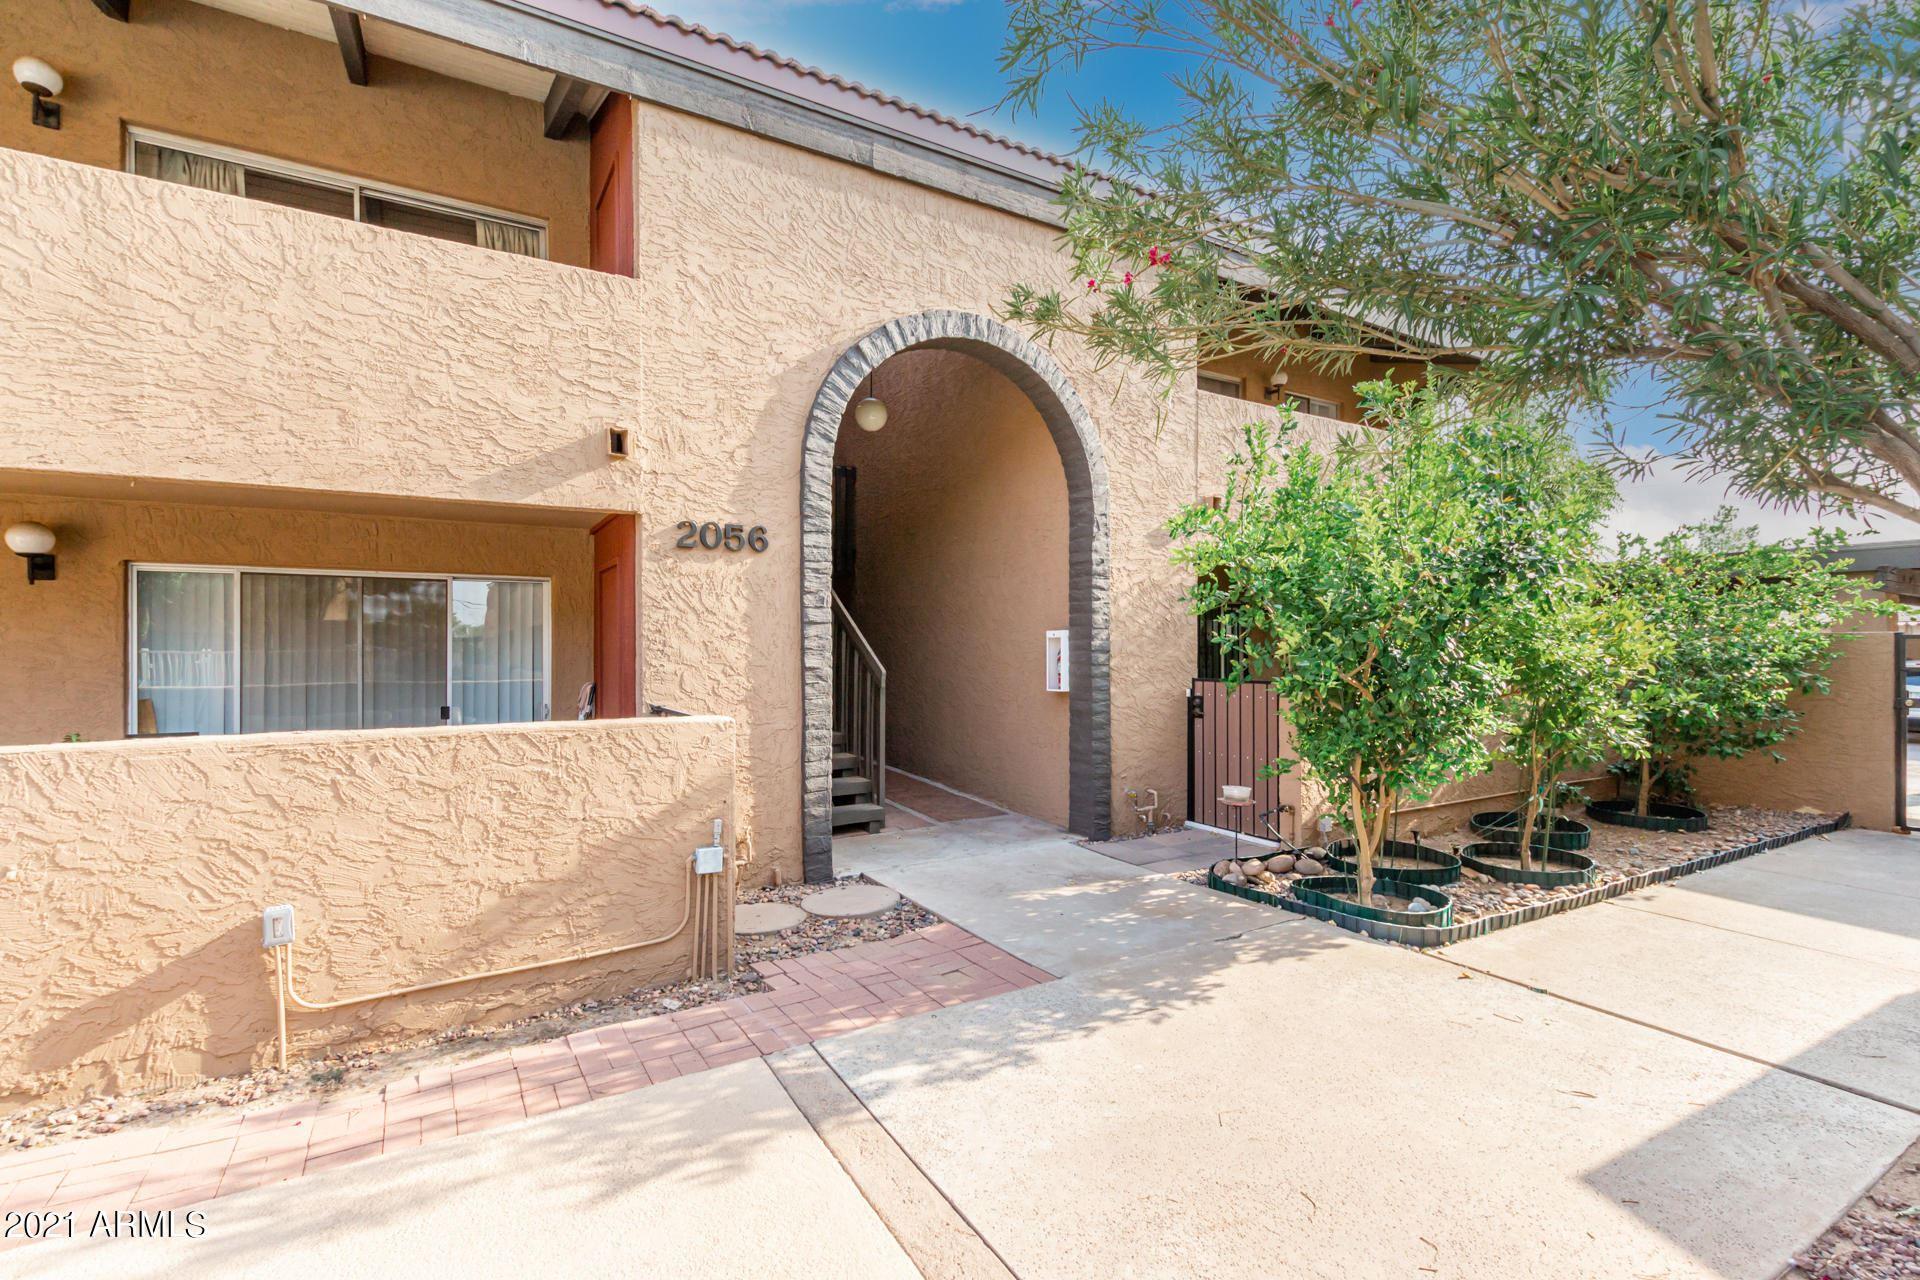 Photo of 2056 S RURAL Road #C, Tempe, AZ 85282 (MLS # 6269320)